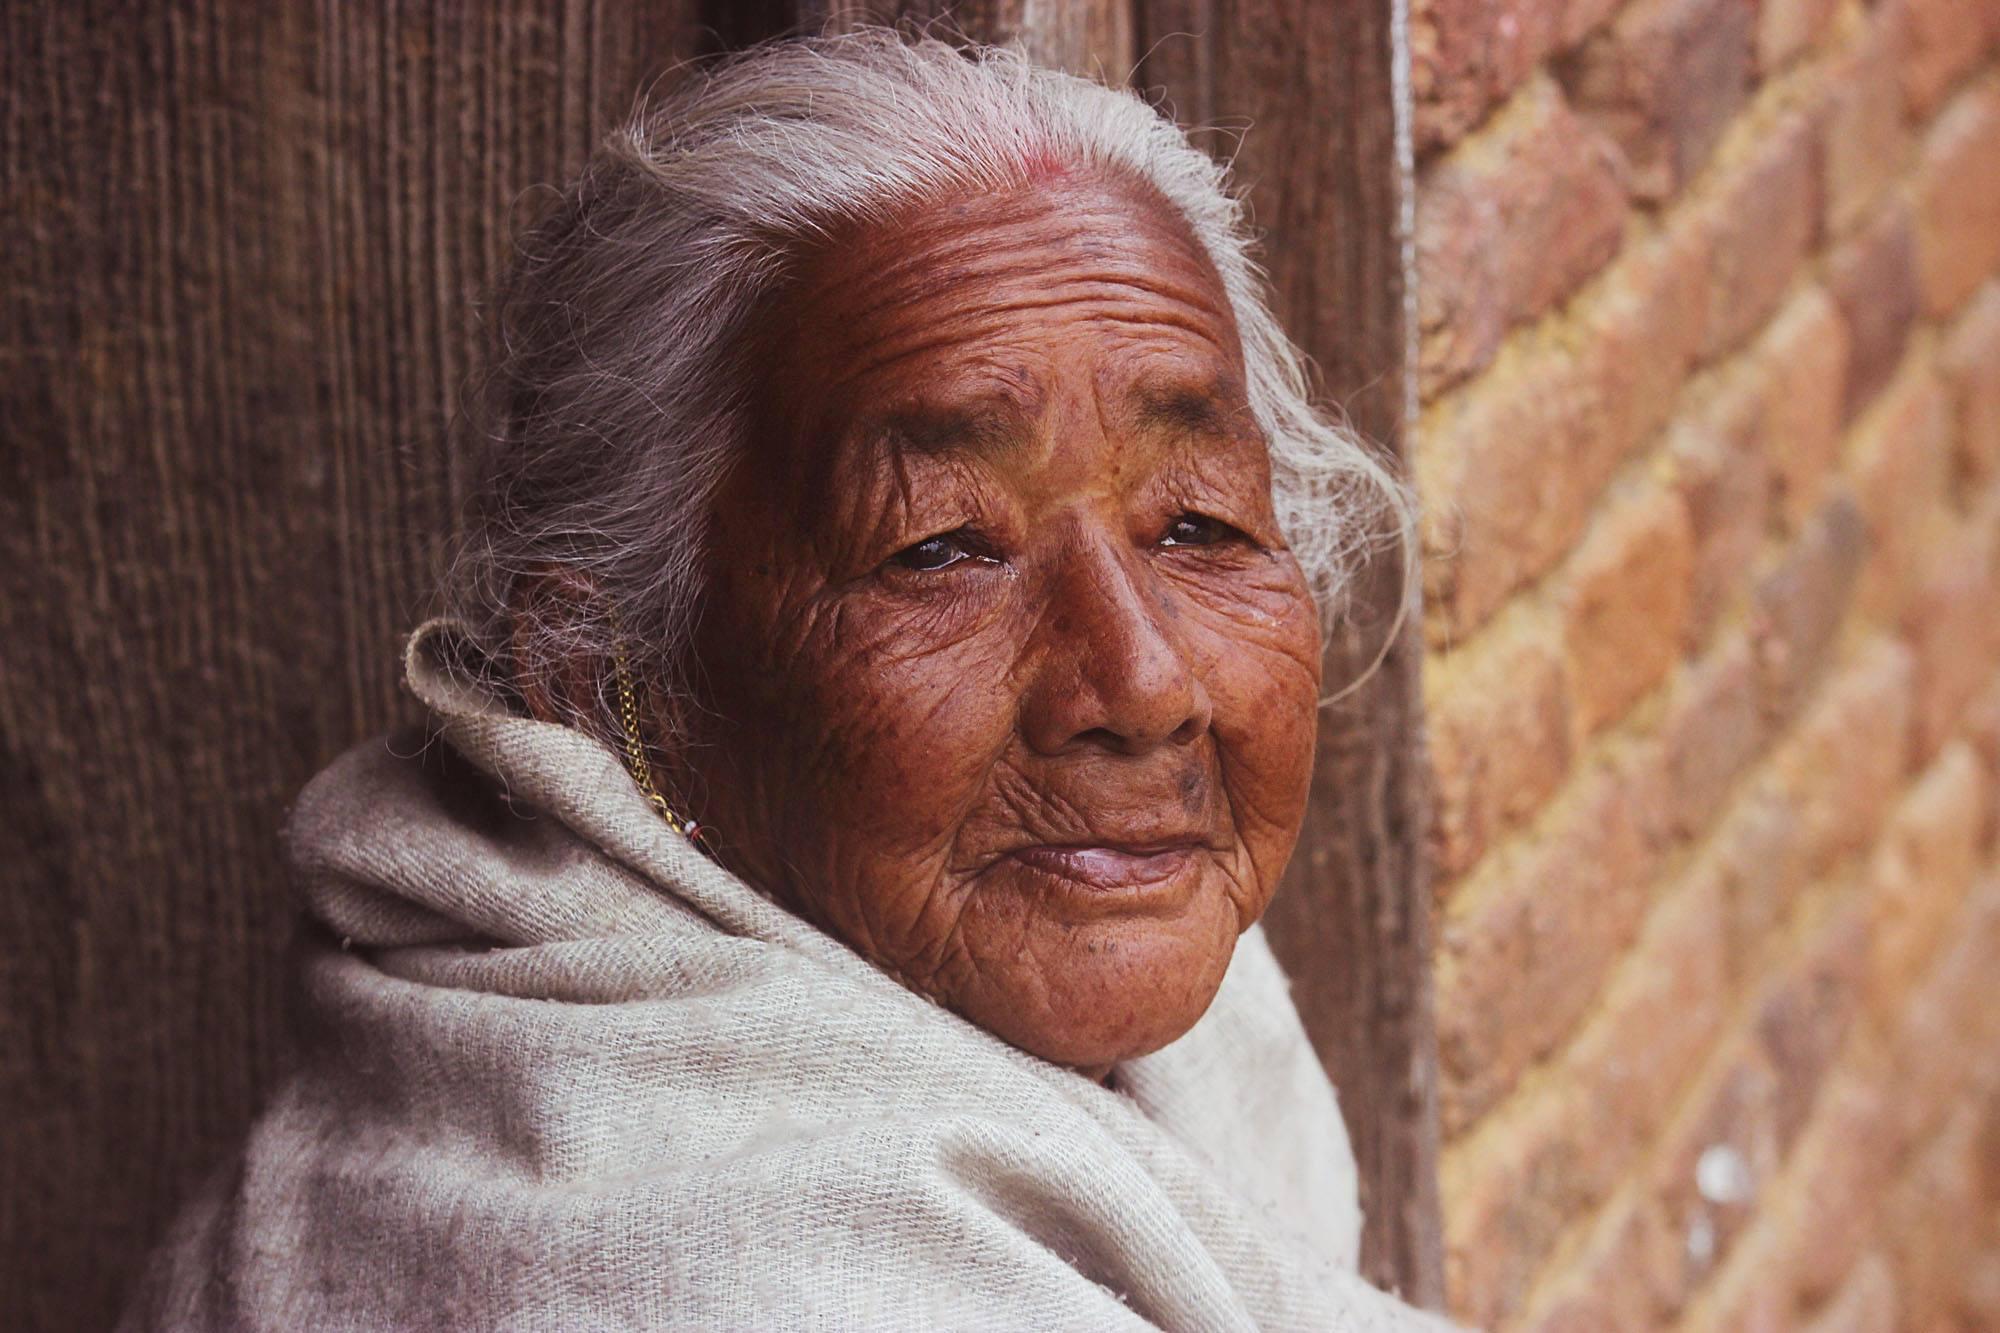 @ Nepal Portrait. Photograph by Anjan Ghosh 2015